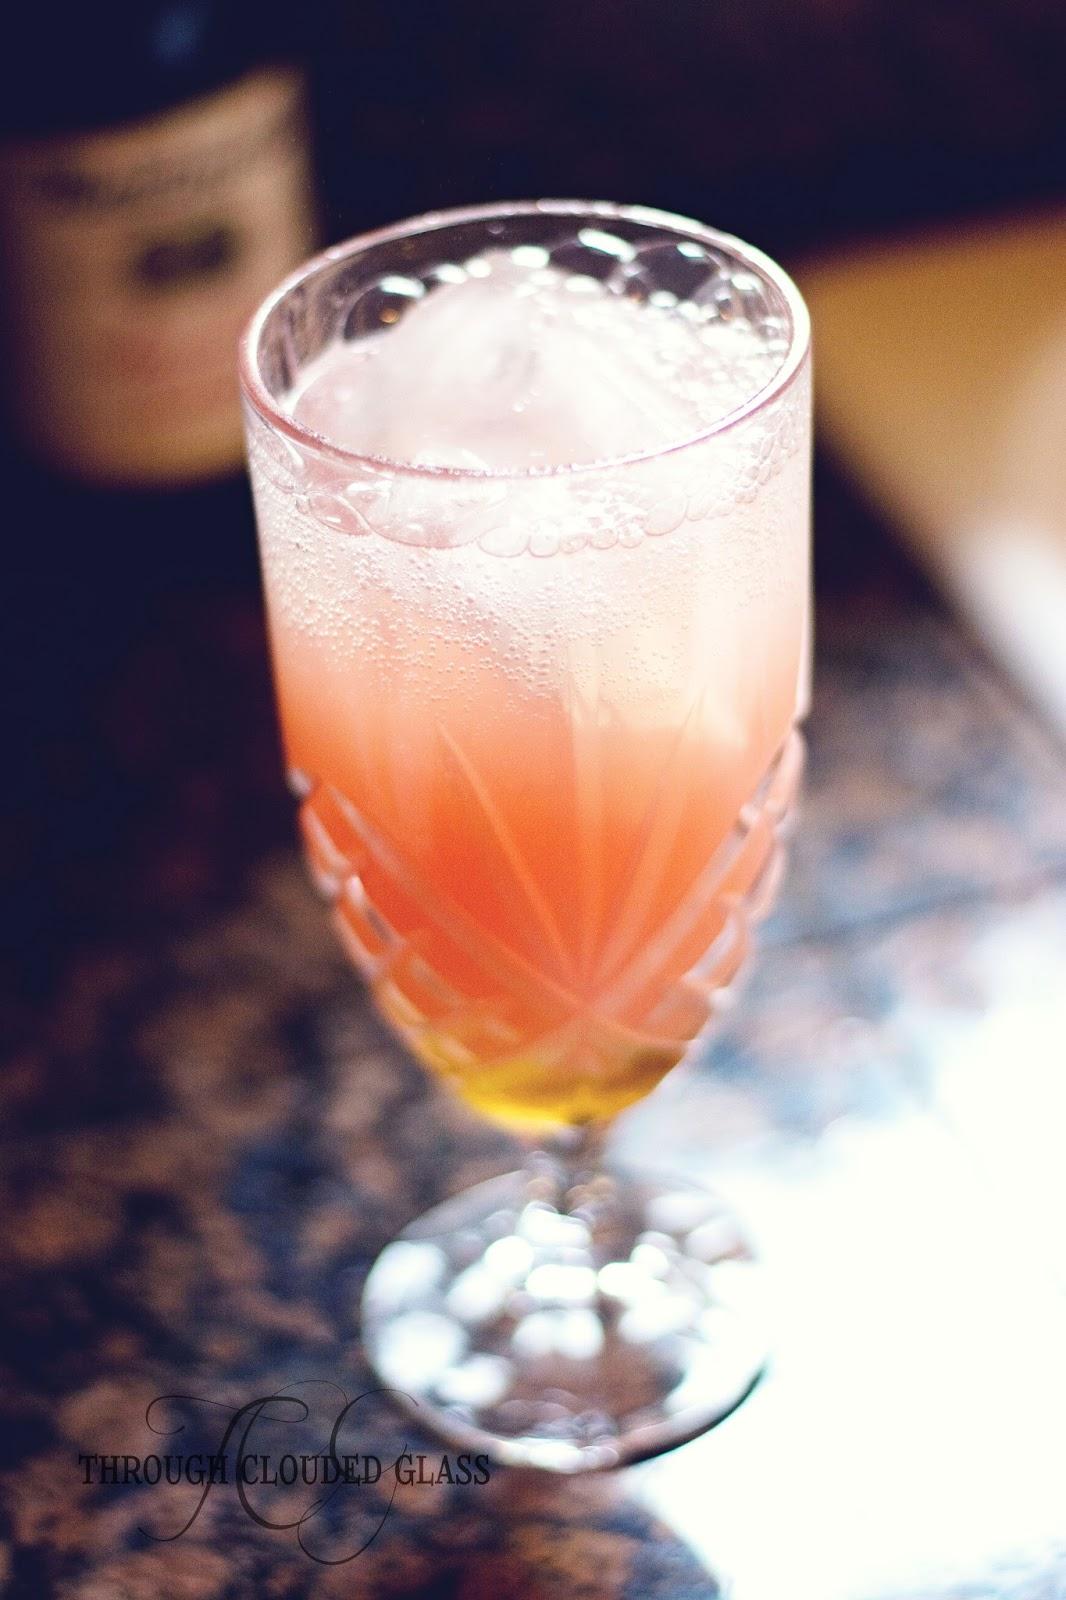 Watermelon lemonade spritzer non alcoholic summer drink recipe through clouded glass - Lemonade recipes popular less known ...